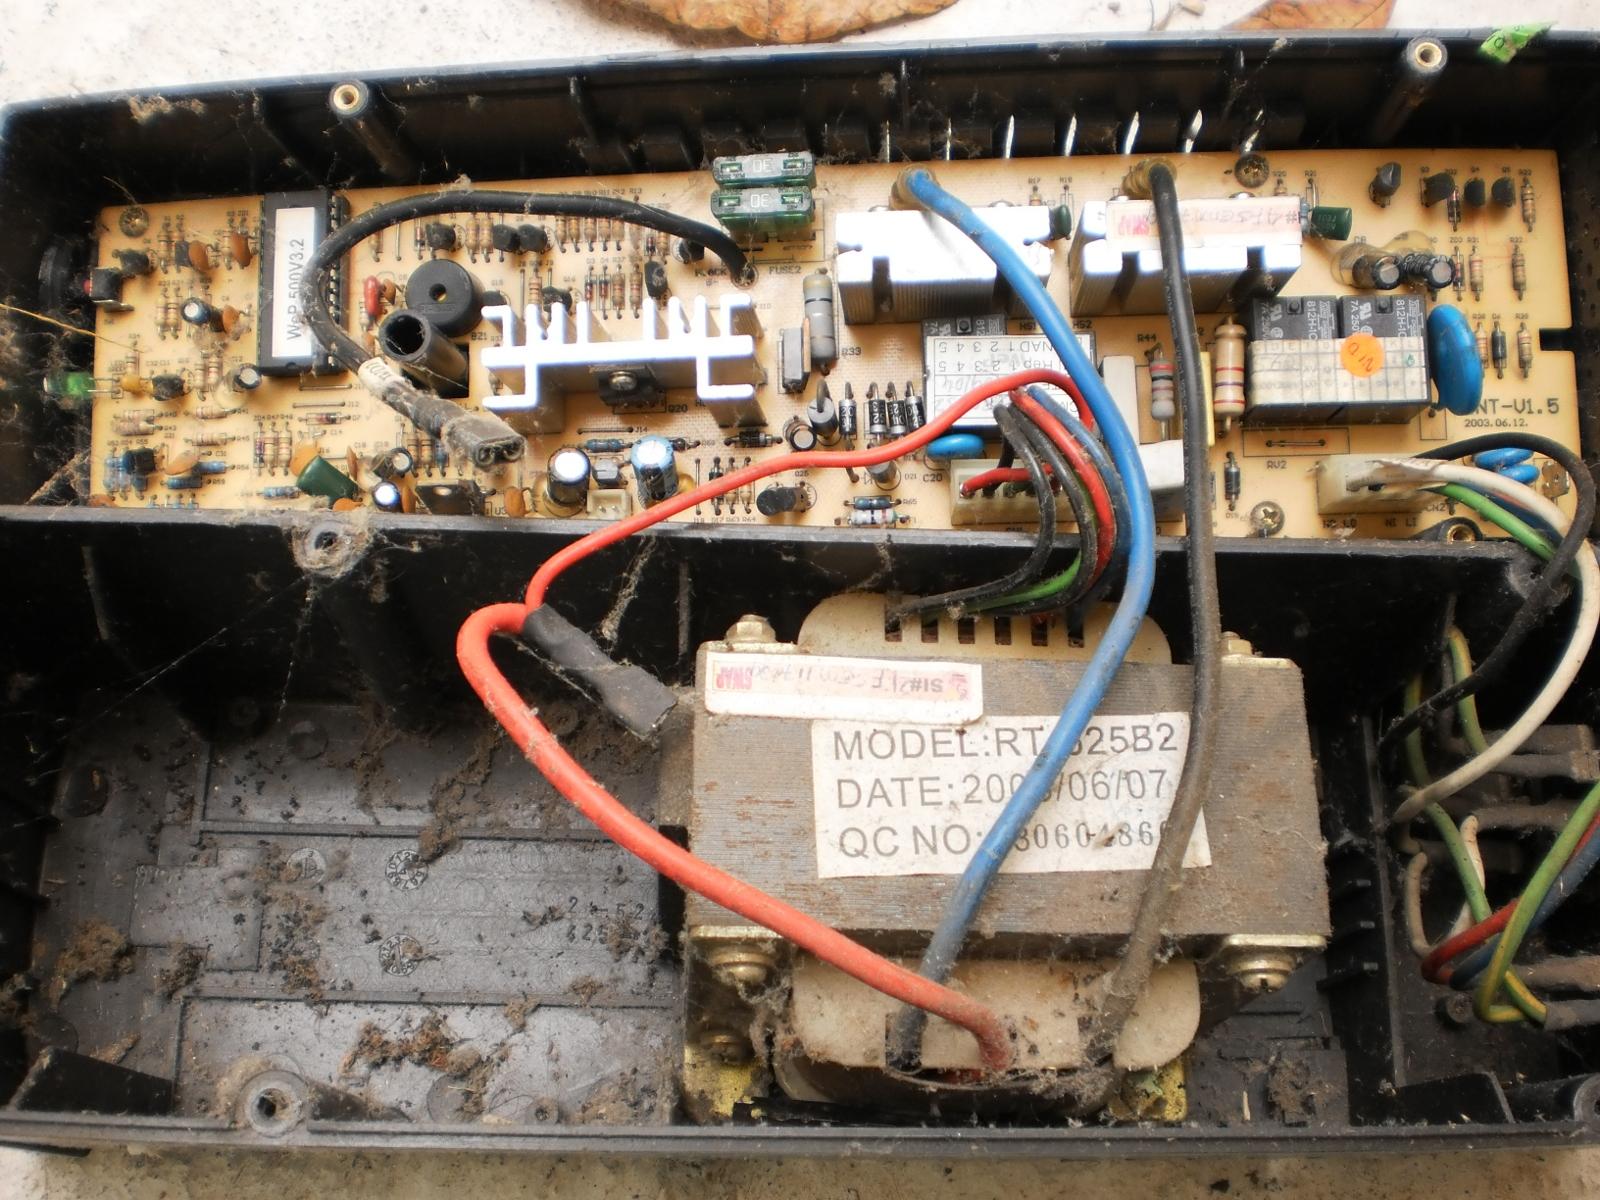 Kichler Transformer Wiring Diagram : Kichler transformer wiring instructions efcaviation